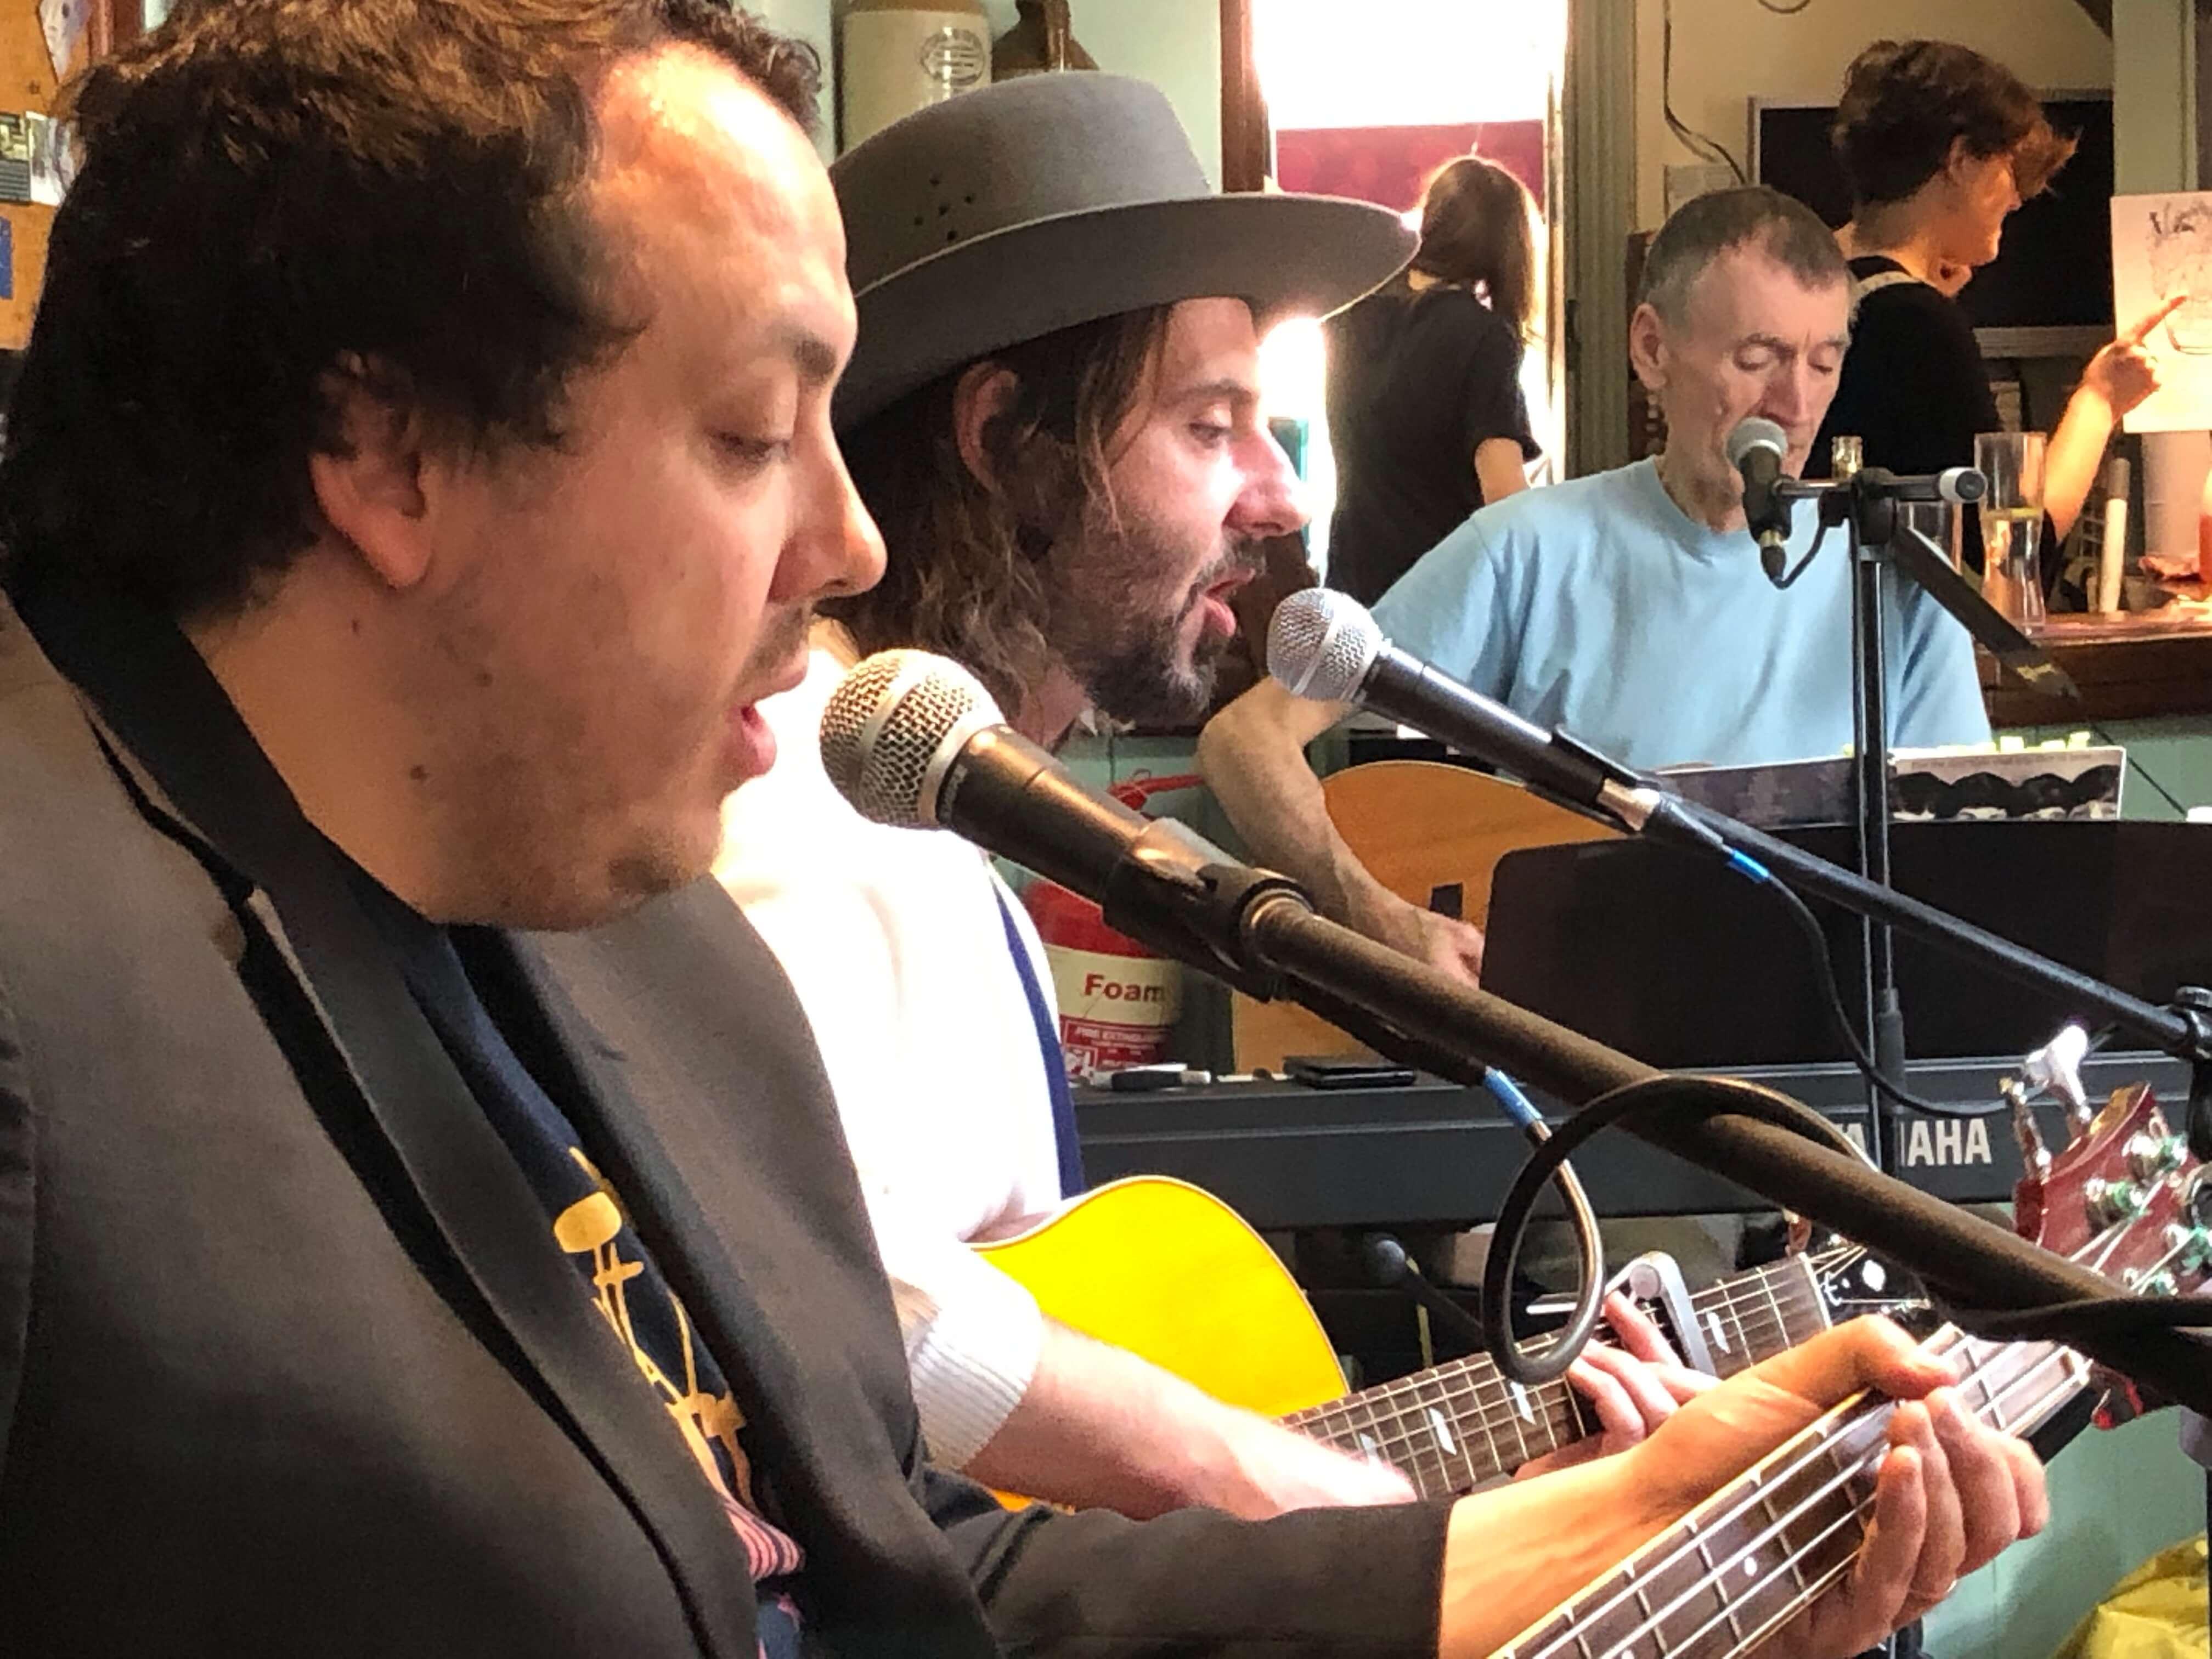 Acoustic Beatles Shambles at The Retreat, Reading, Berkshire